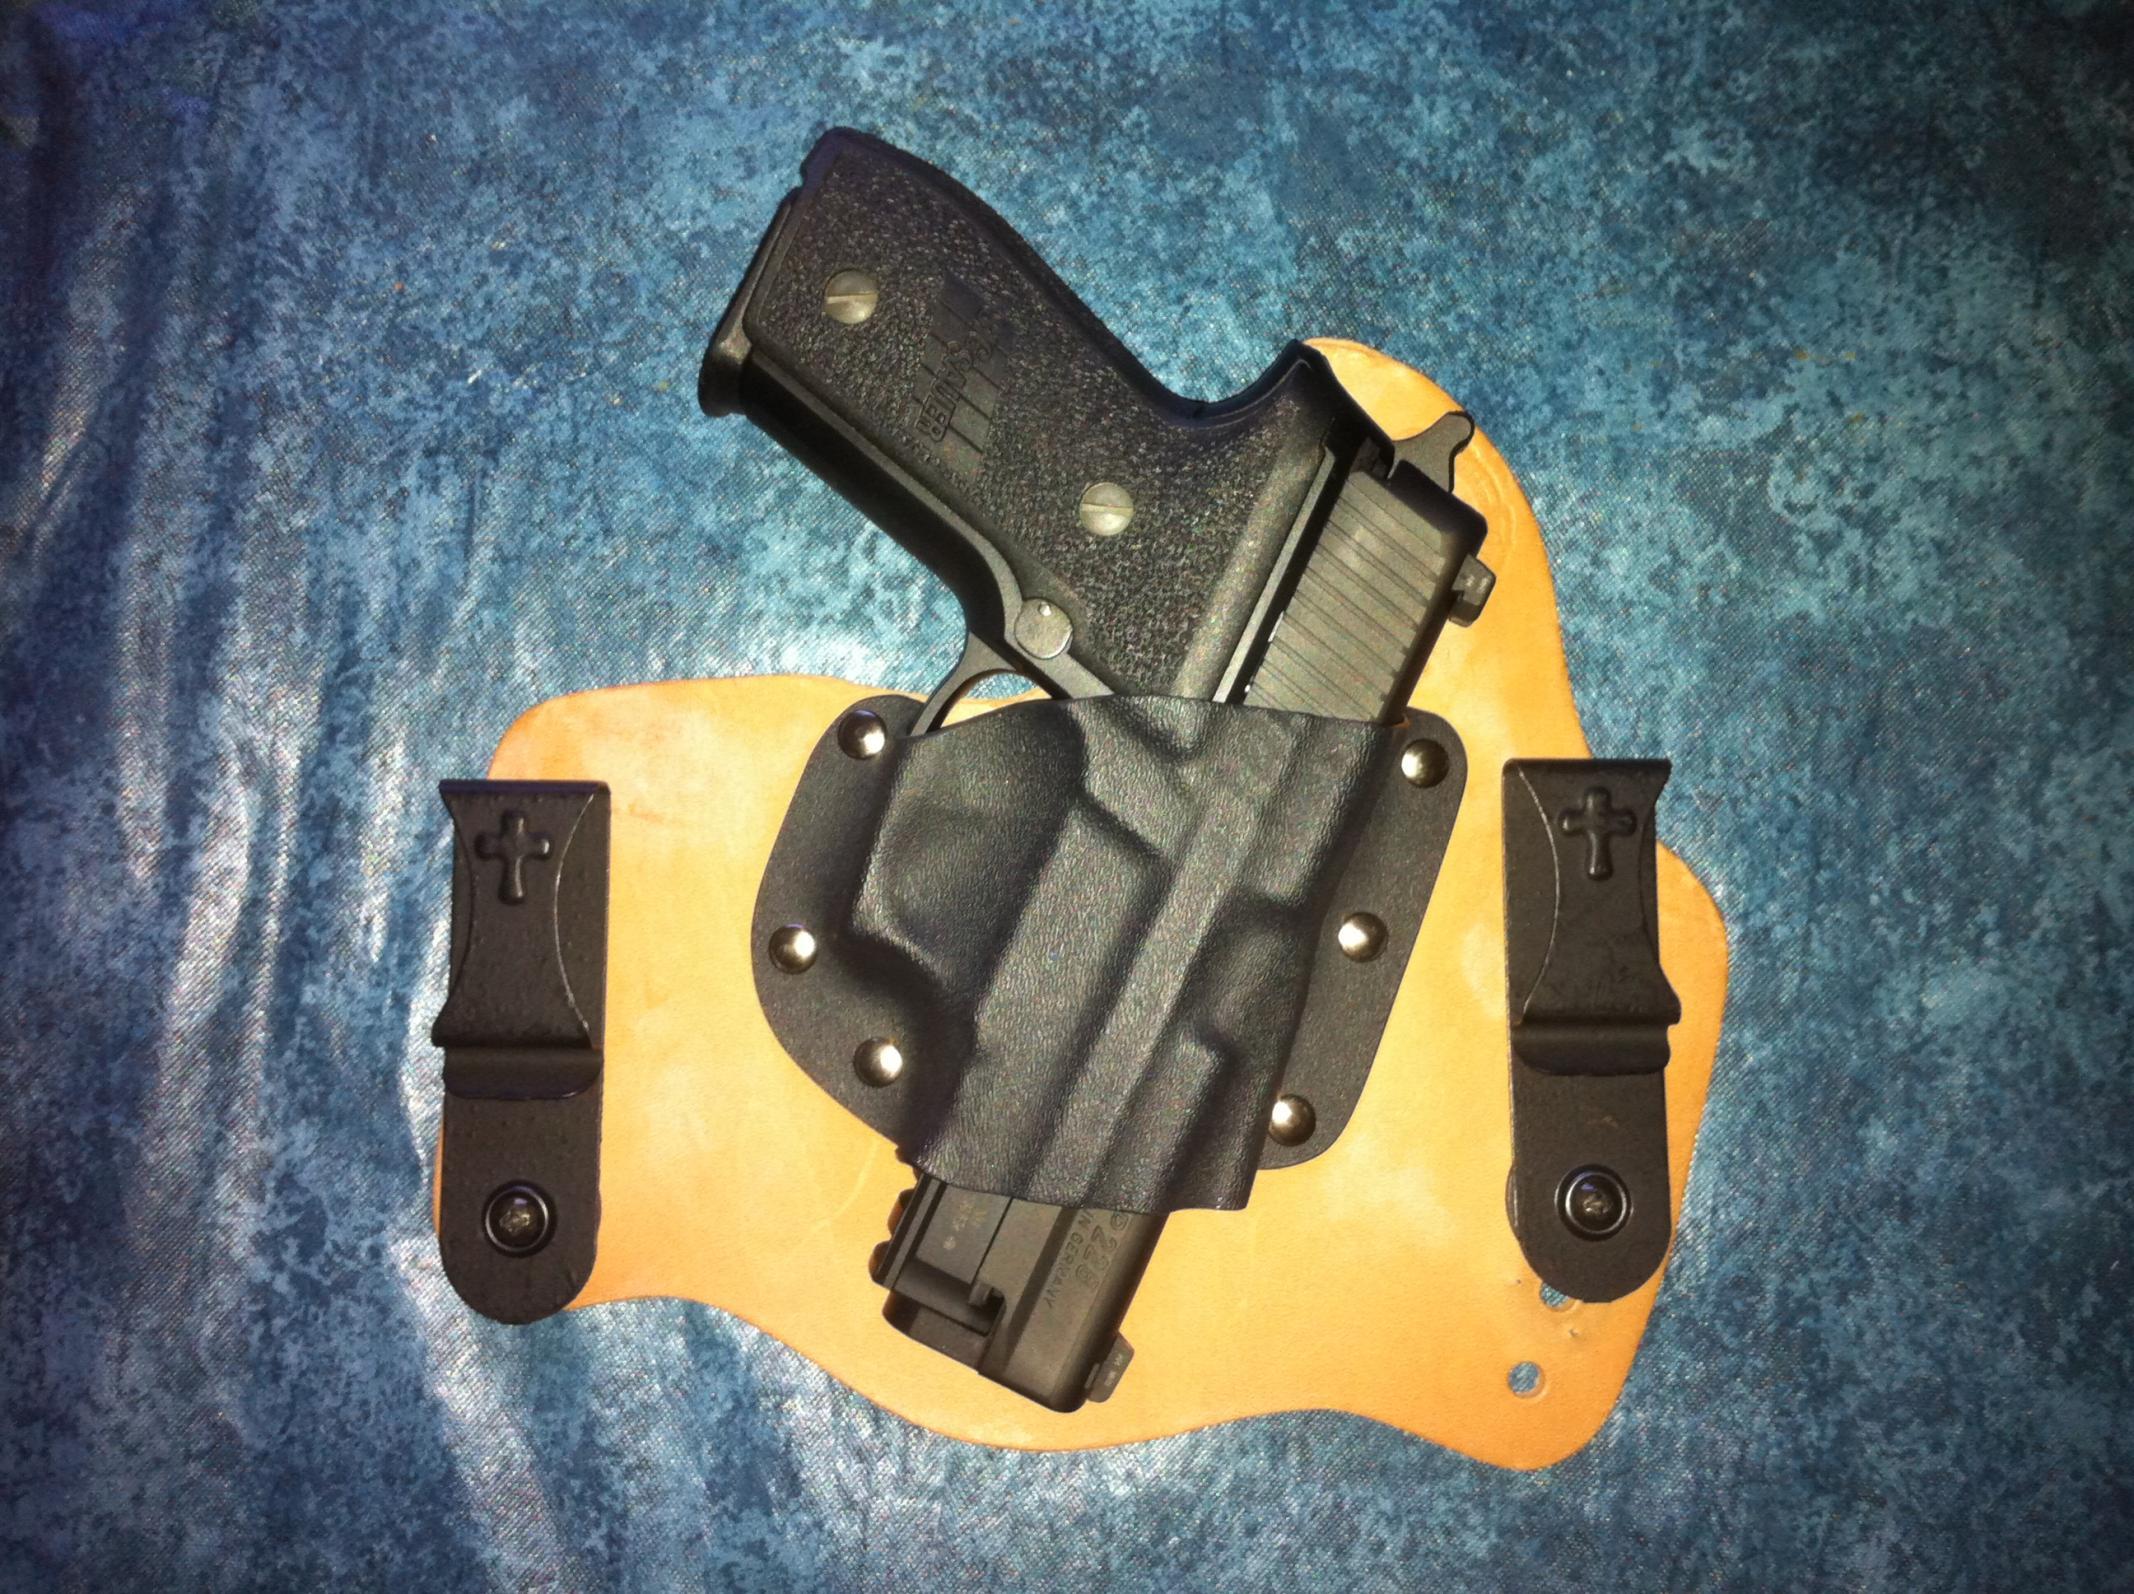 Supertuck pics with guns in.-photo-1.jpg